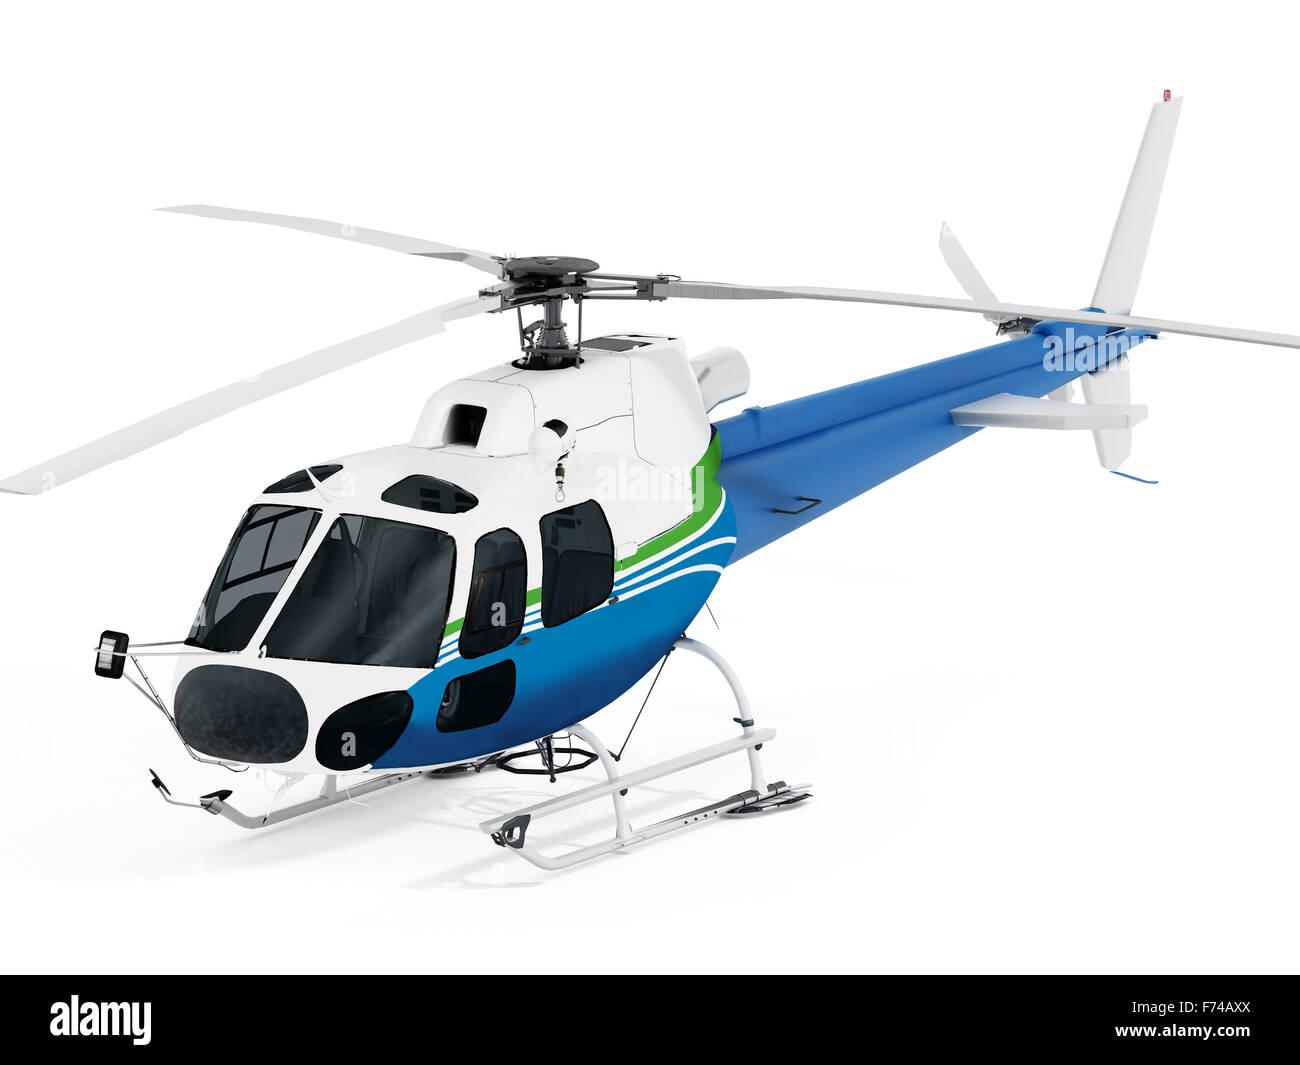 Helicopter isolated on white background. Stock Photo